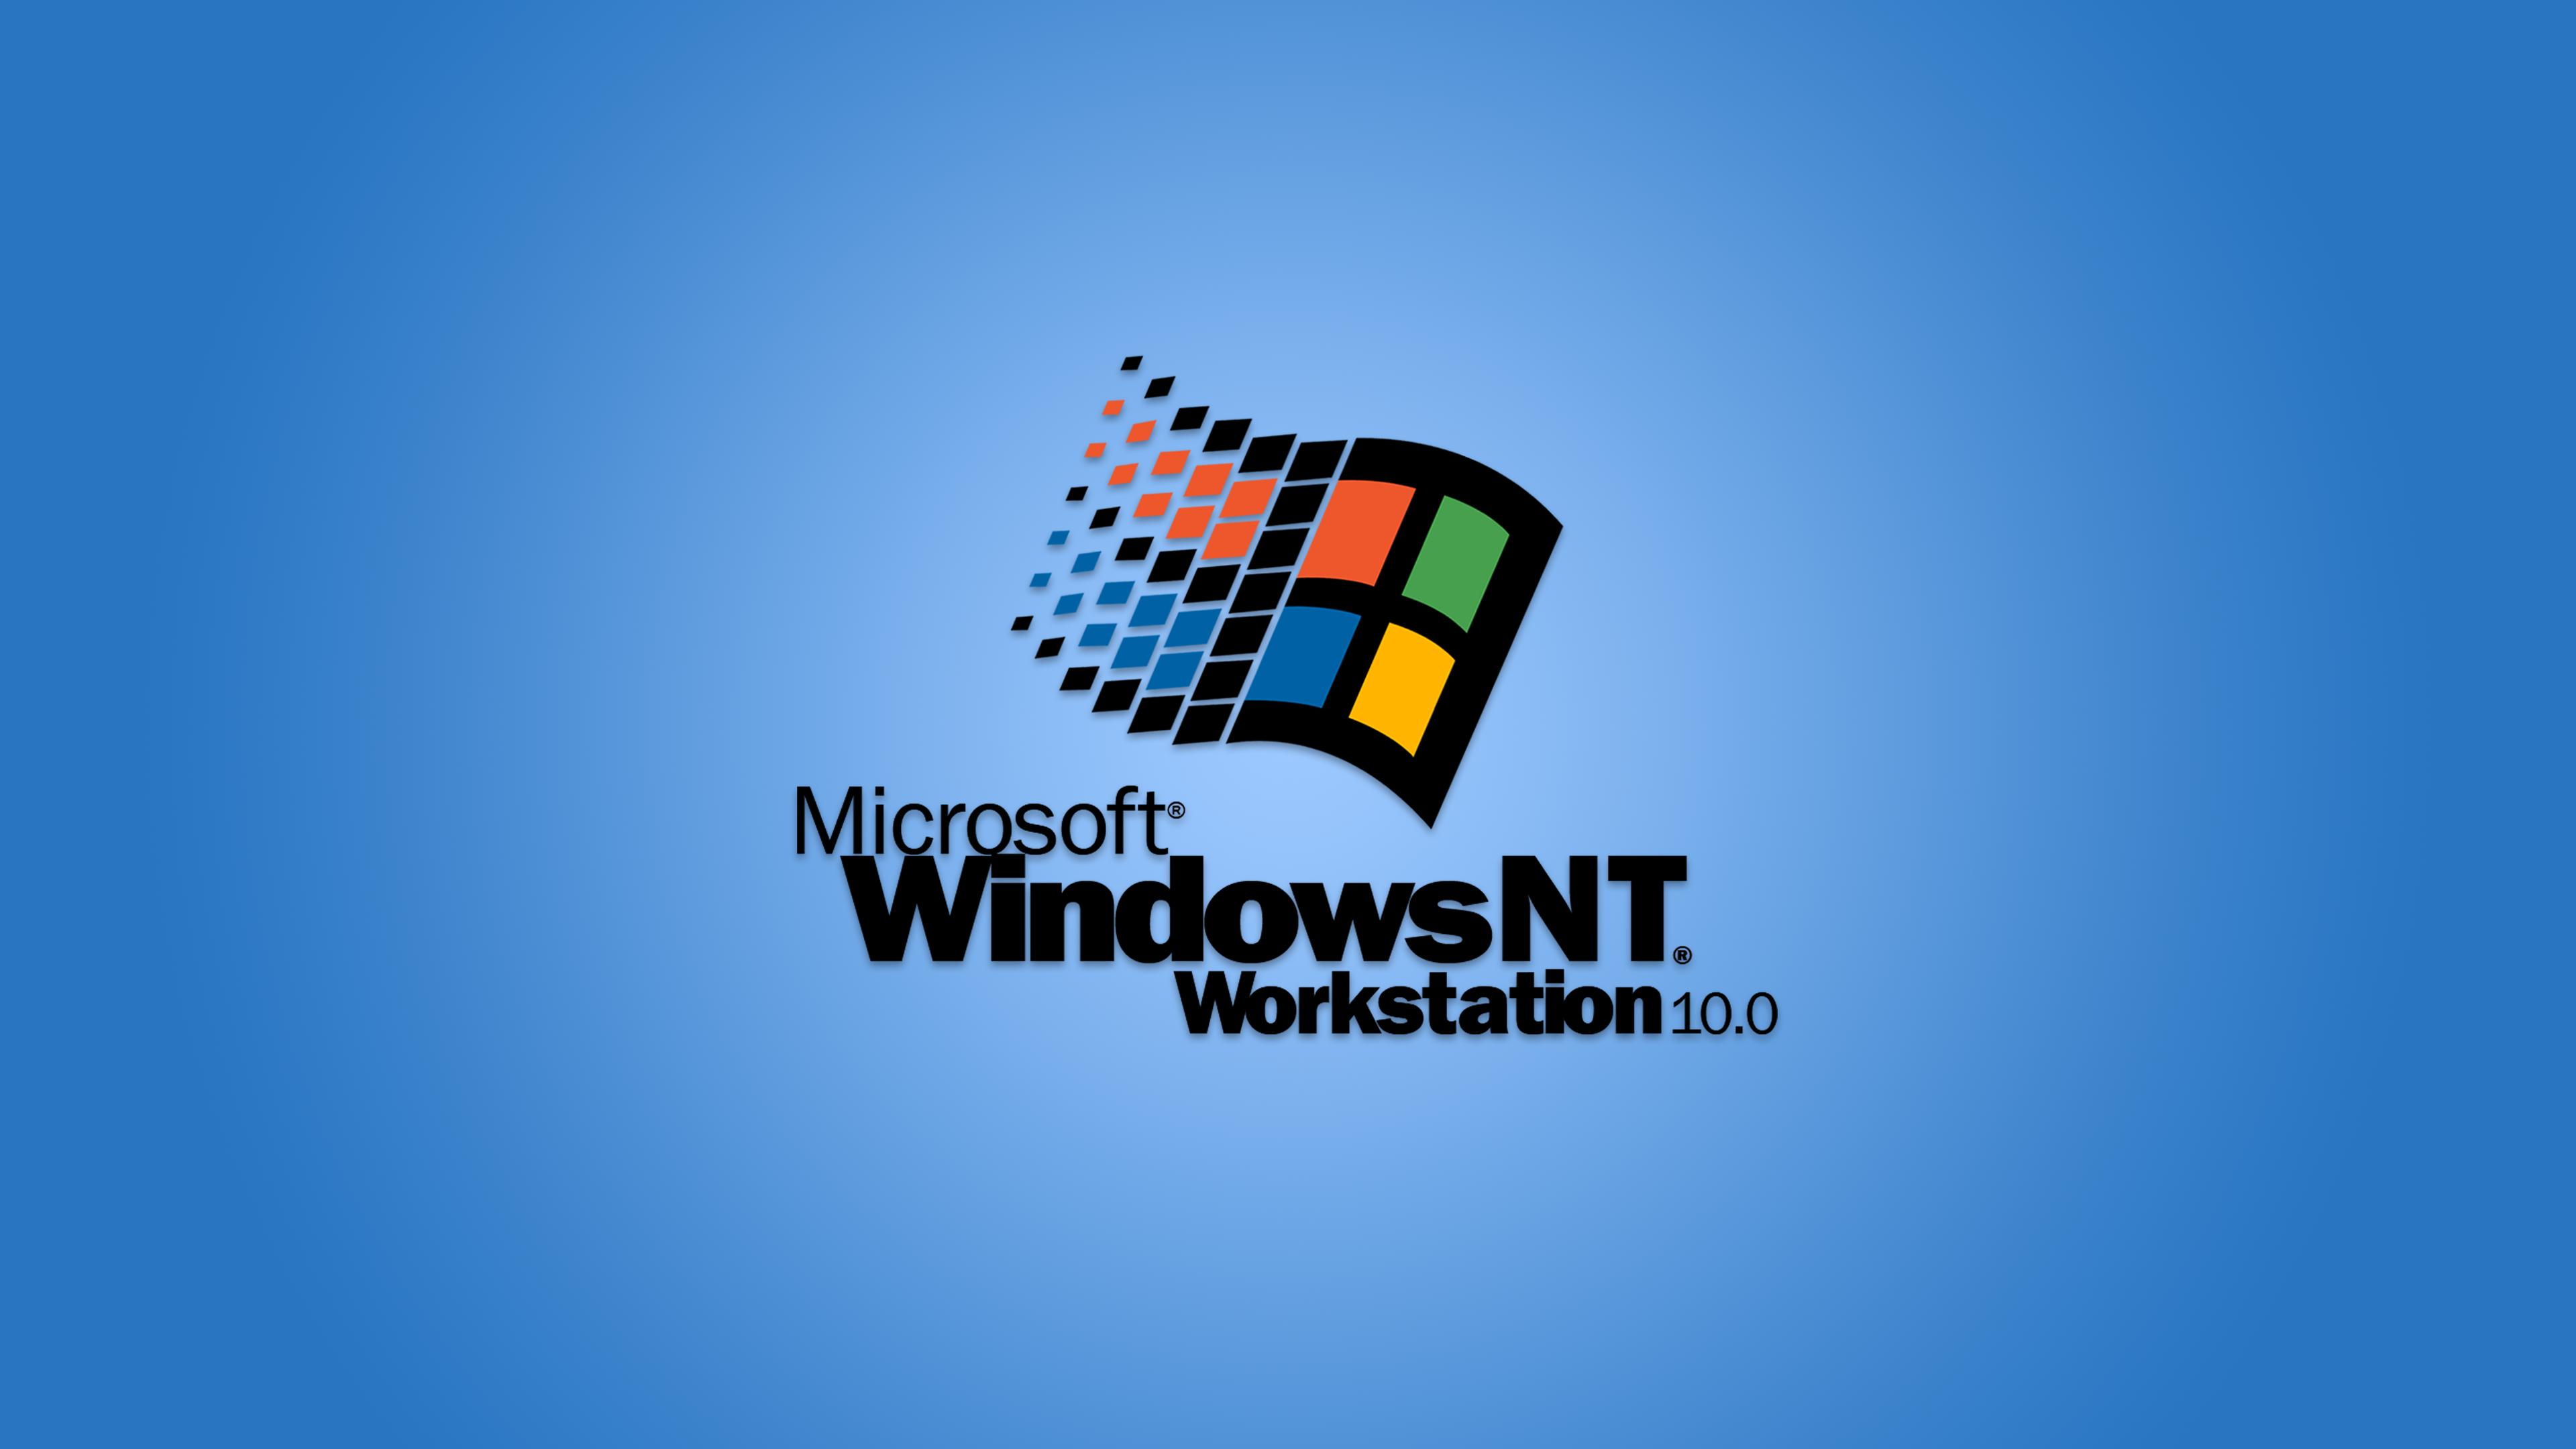 4K Windows 10 Retro Wallpaper By Samforbis On DeviantArt